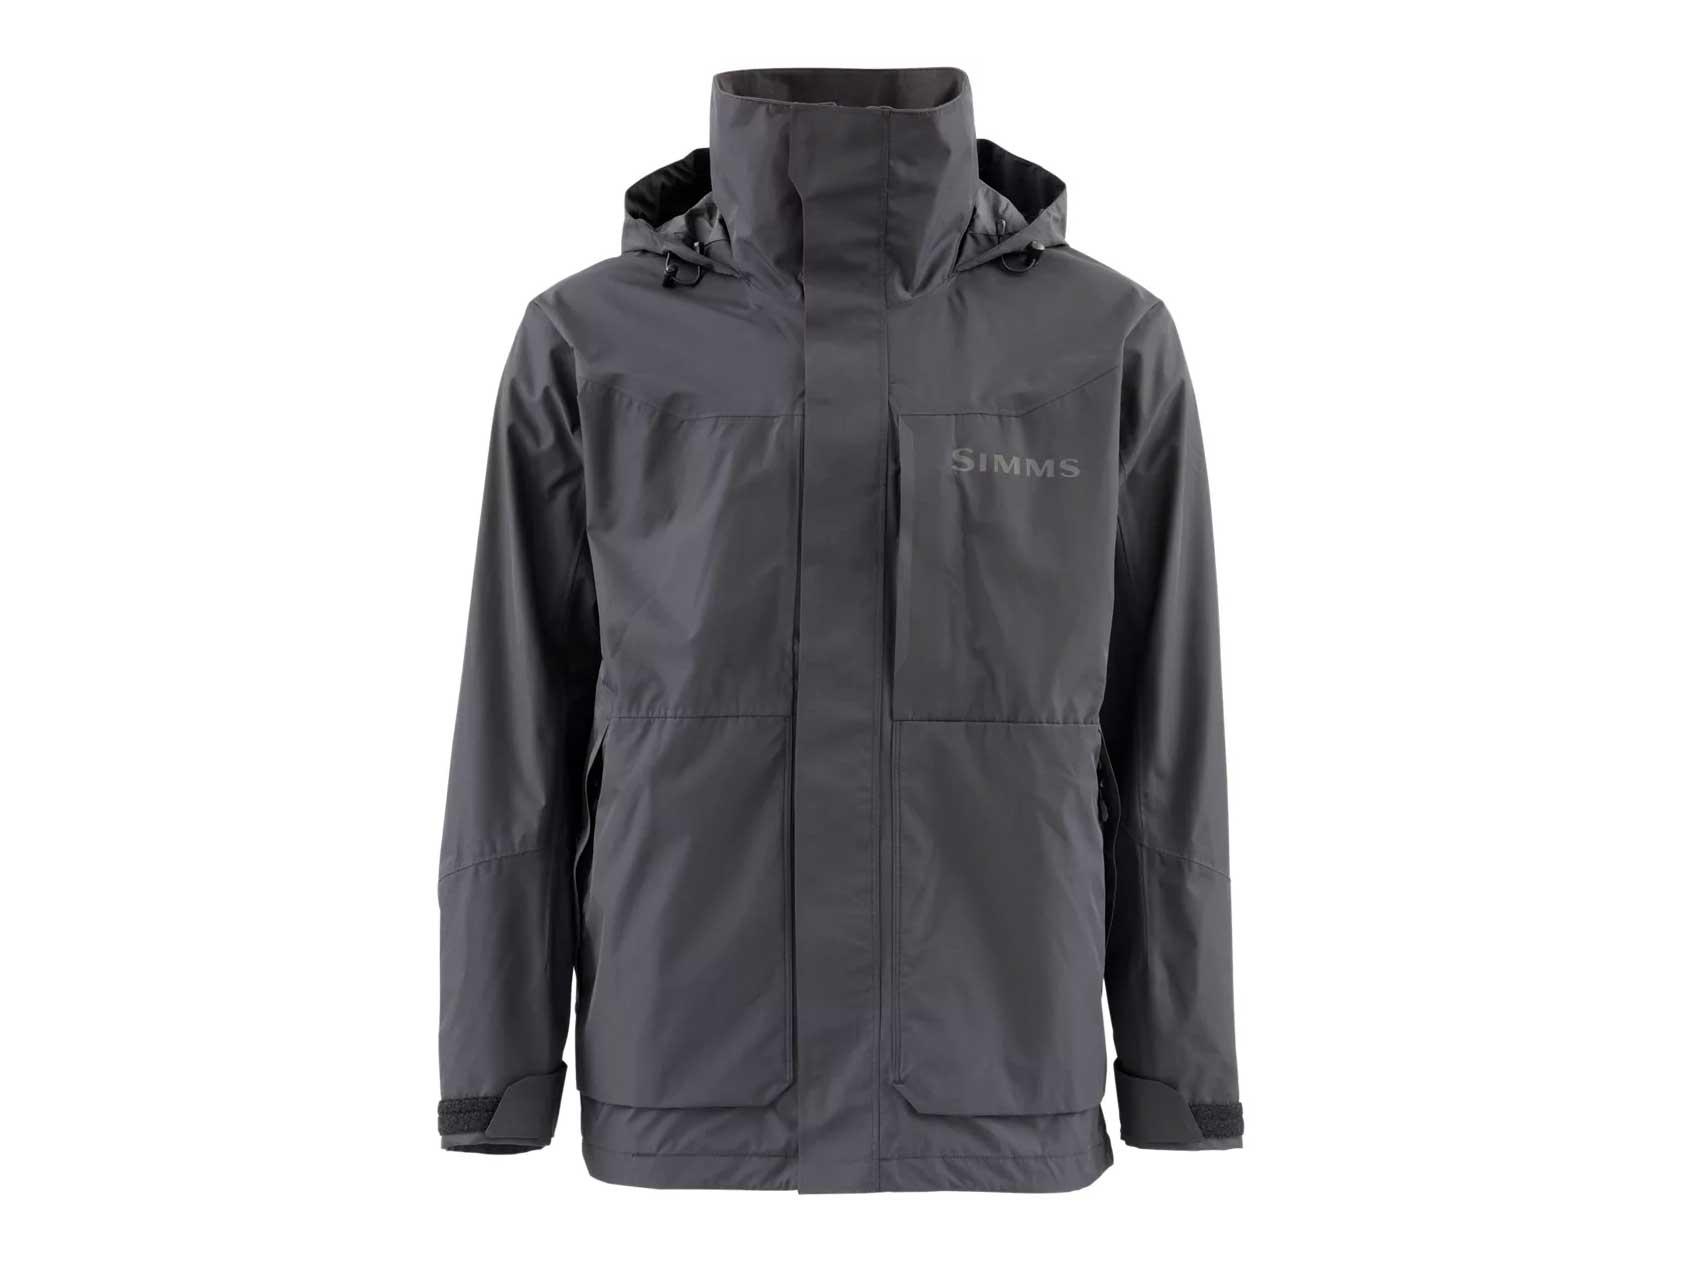 Simms Challenger Rain Jacket for Men